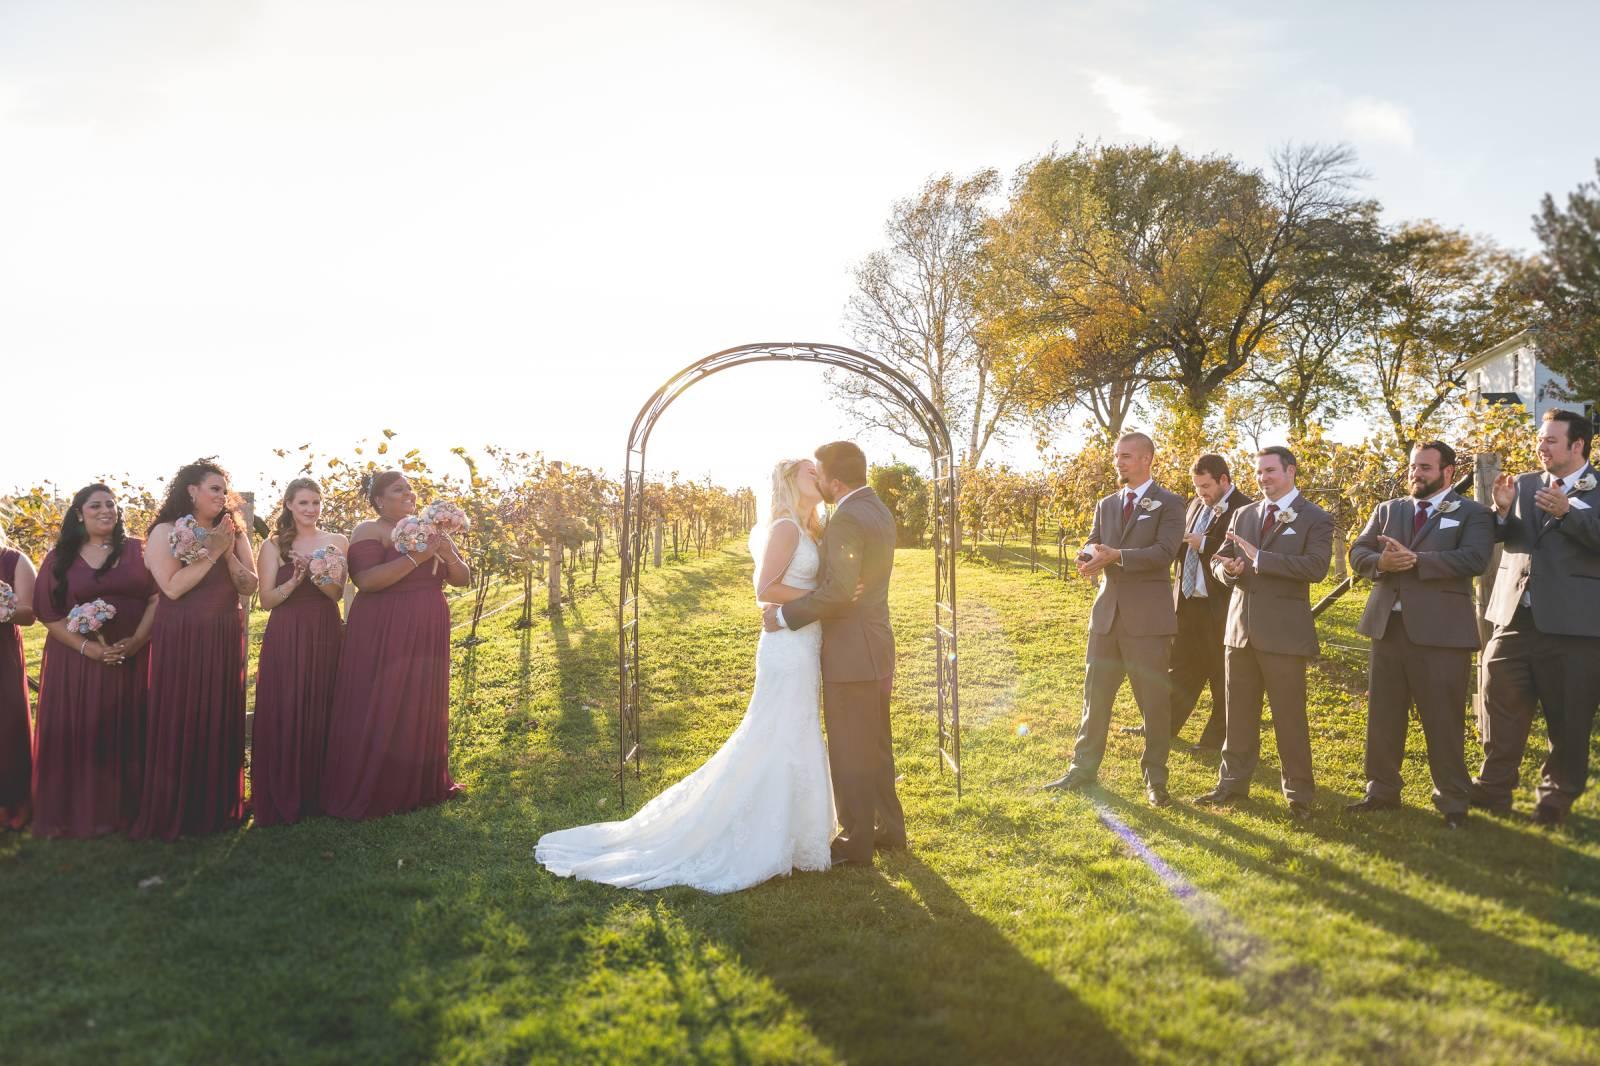 RUSTIC DIY WISCONSIN BARN WEDDING